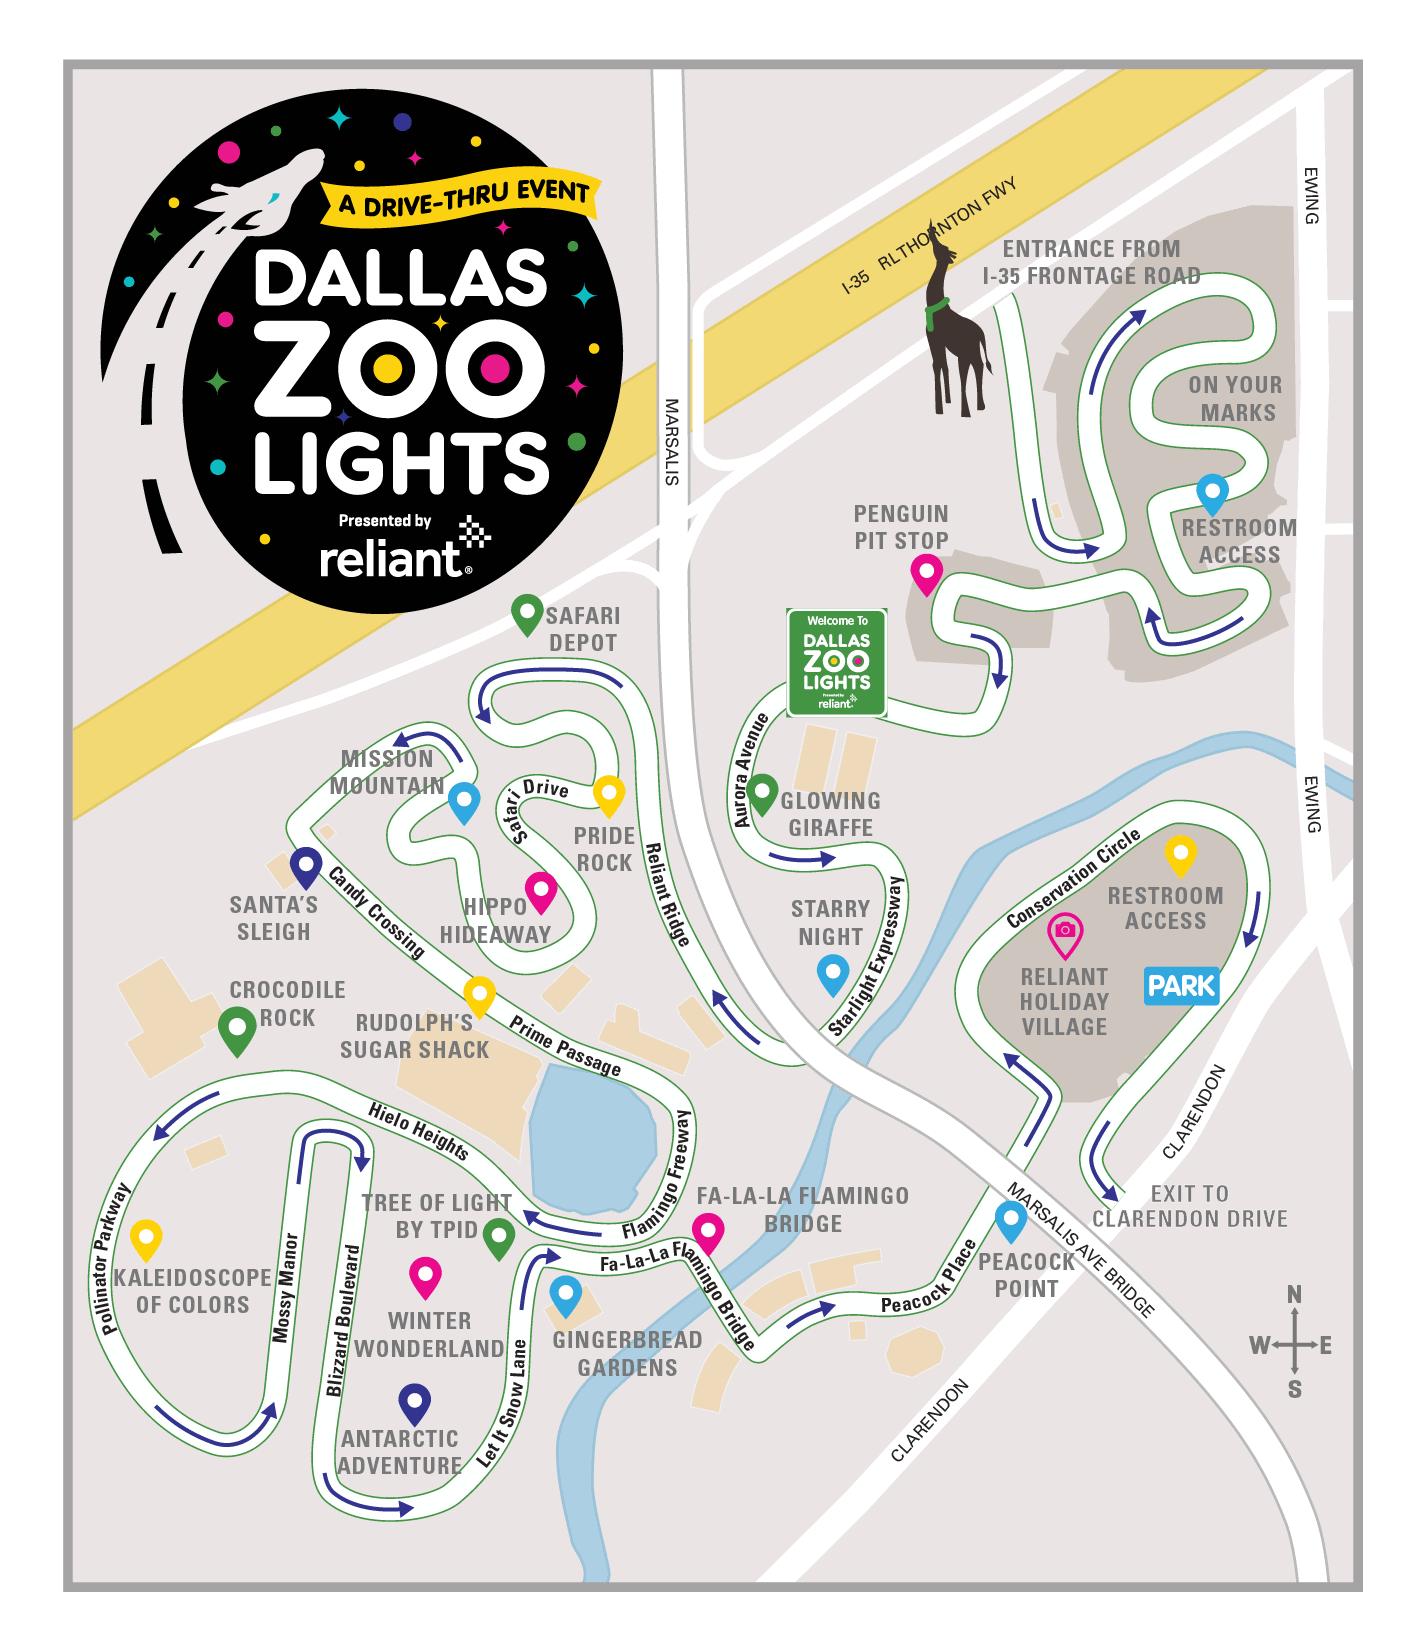 Dallas Zoo lights map